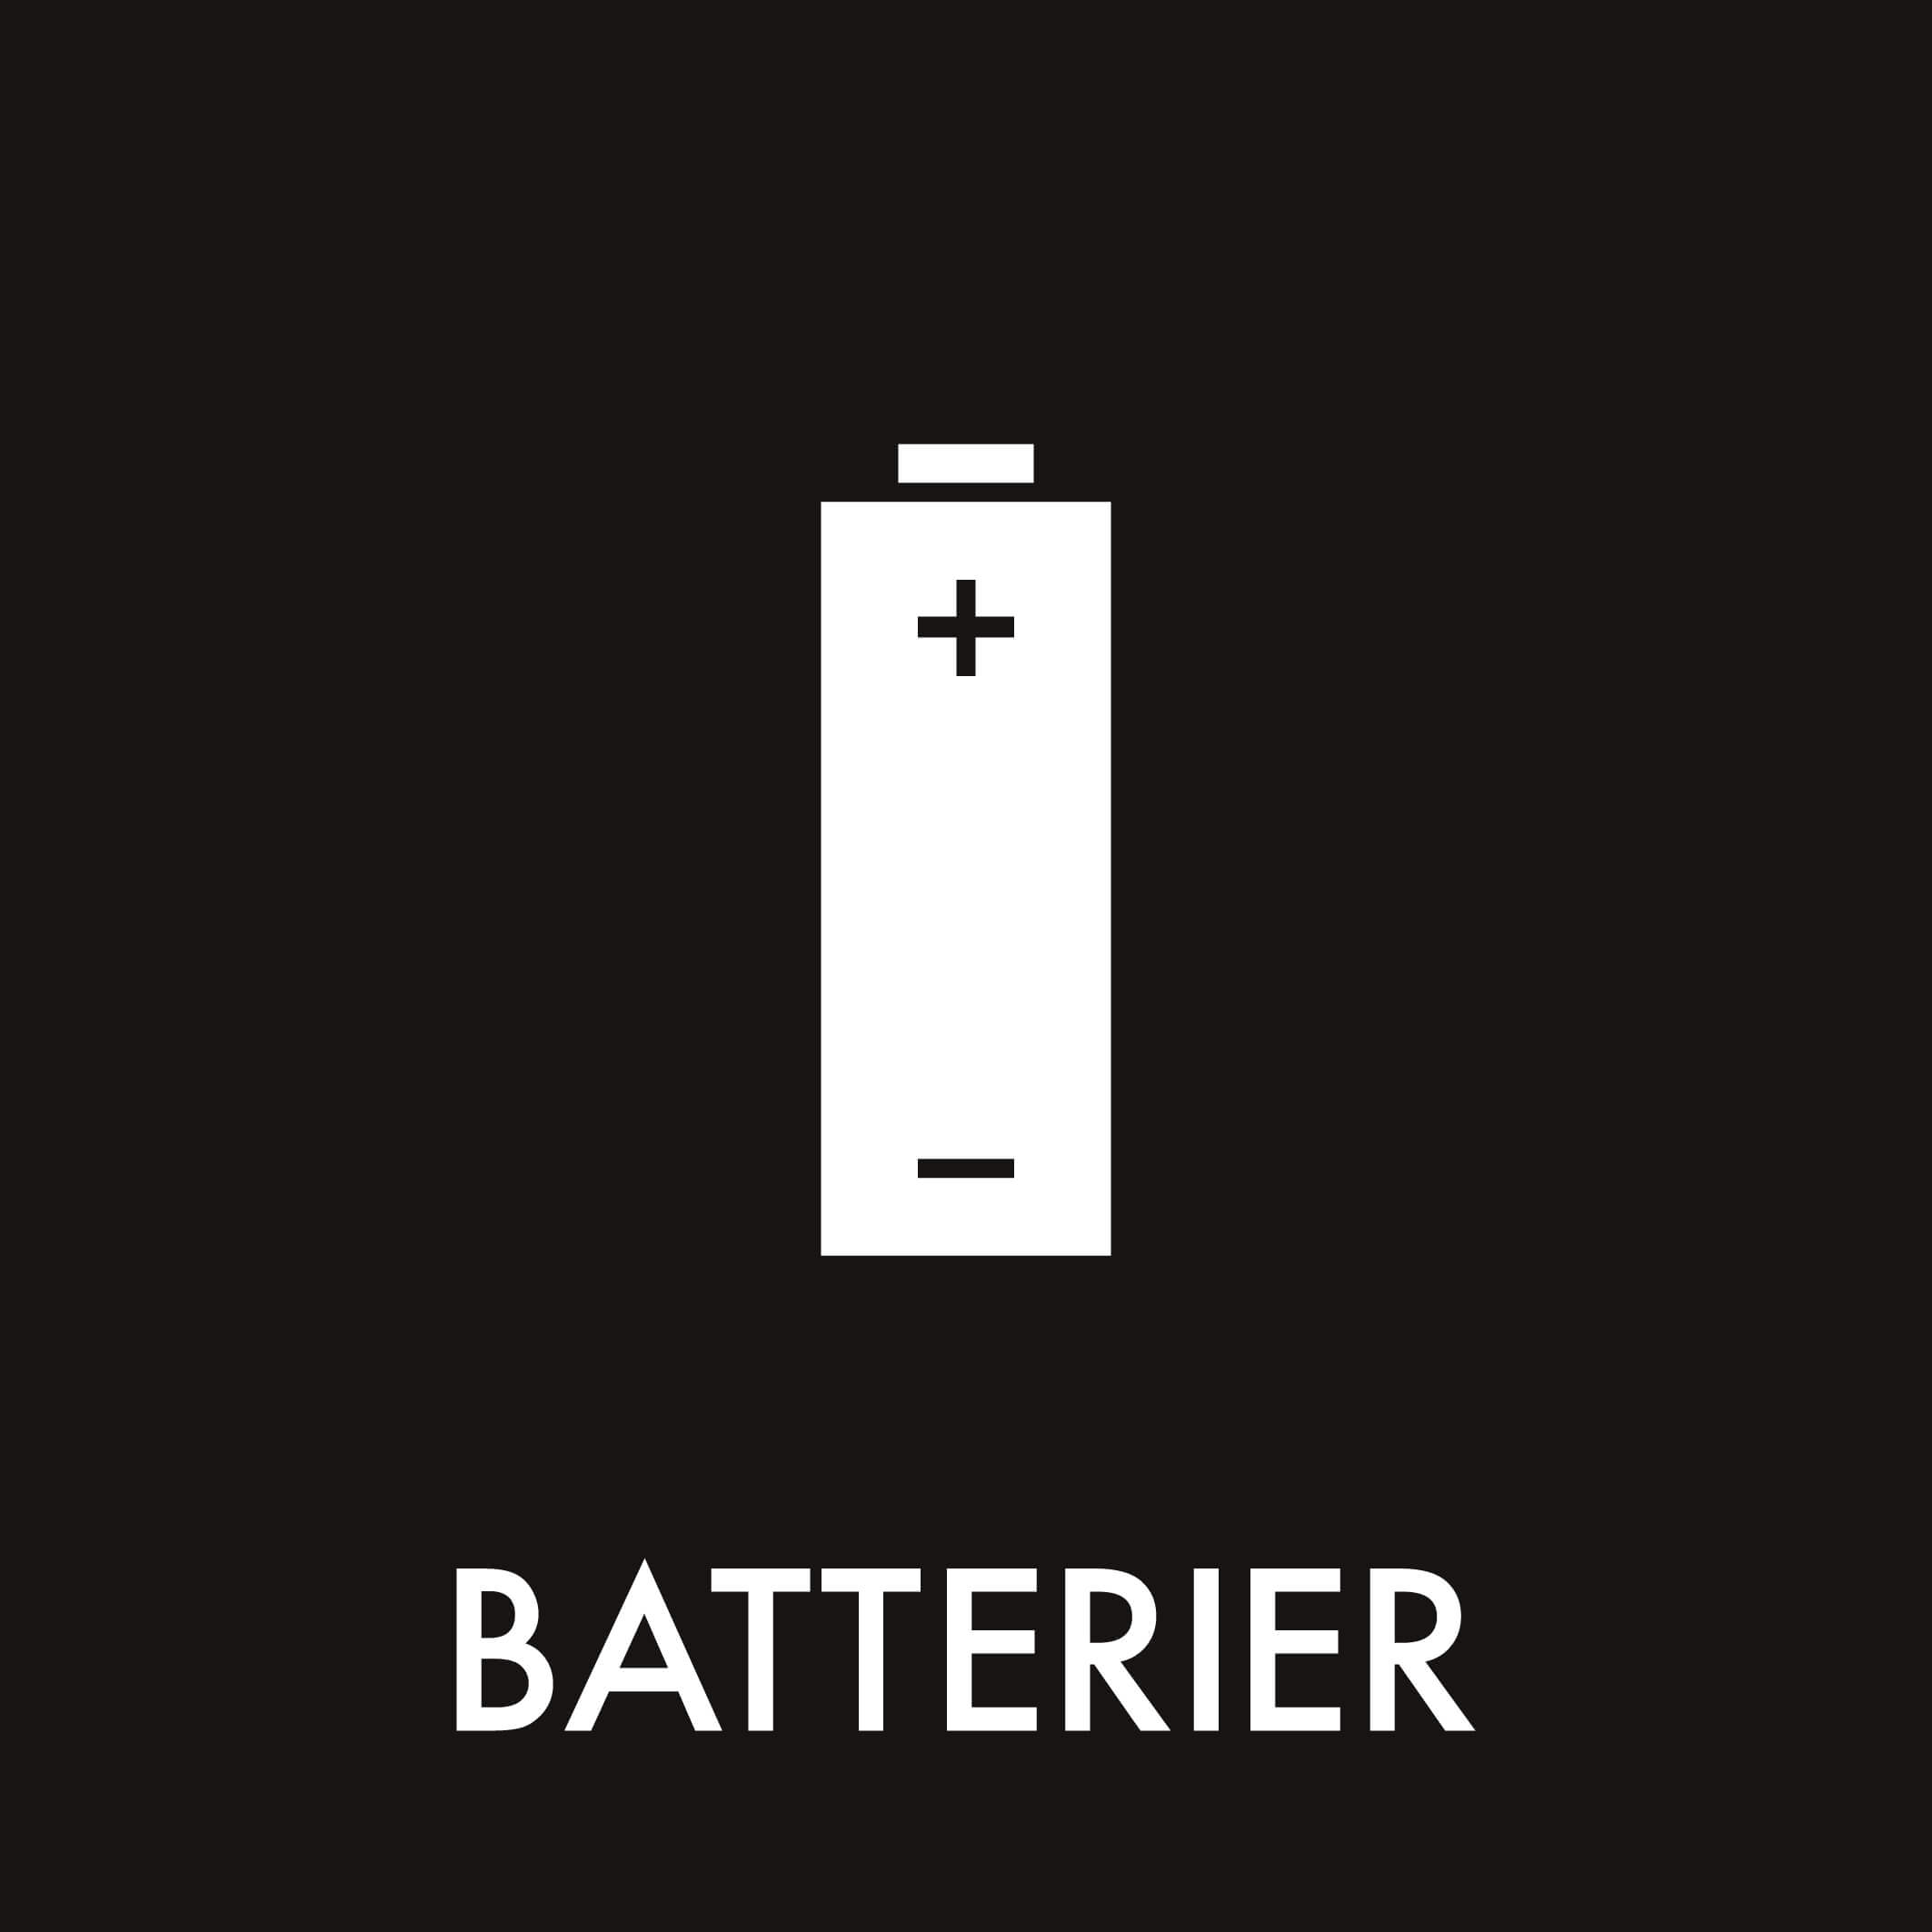 Dansk Affaldssortering - Batterier sort